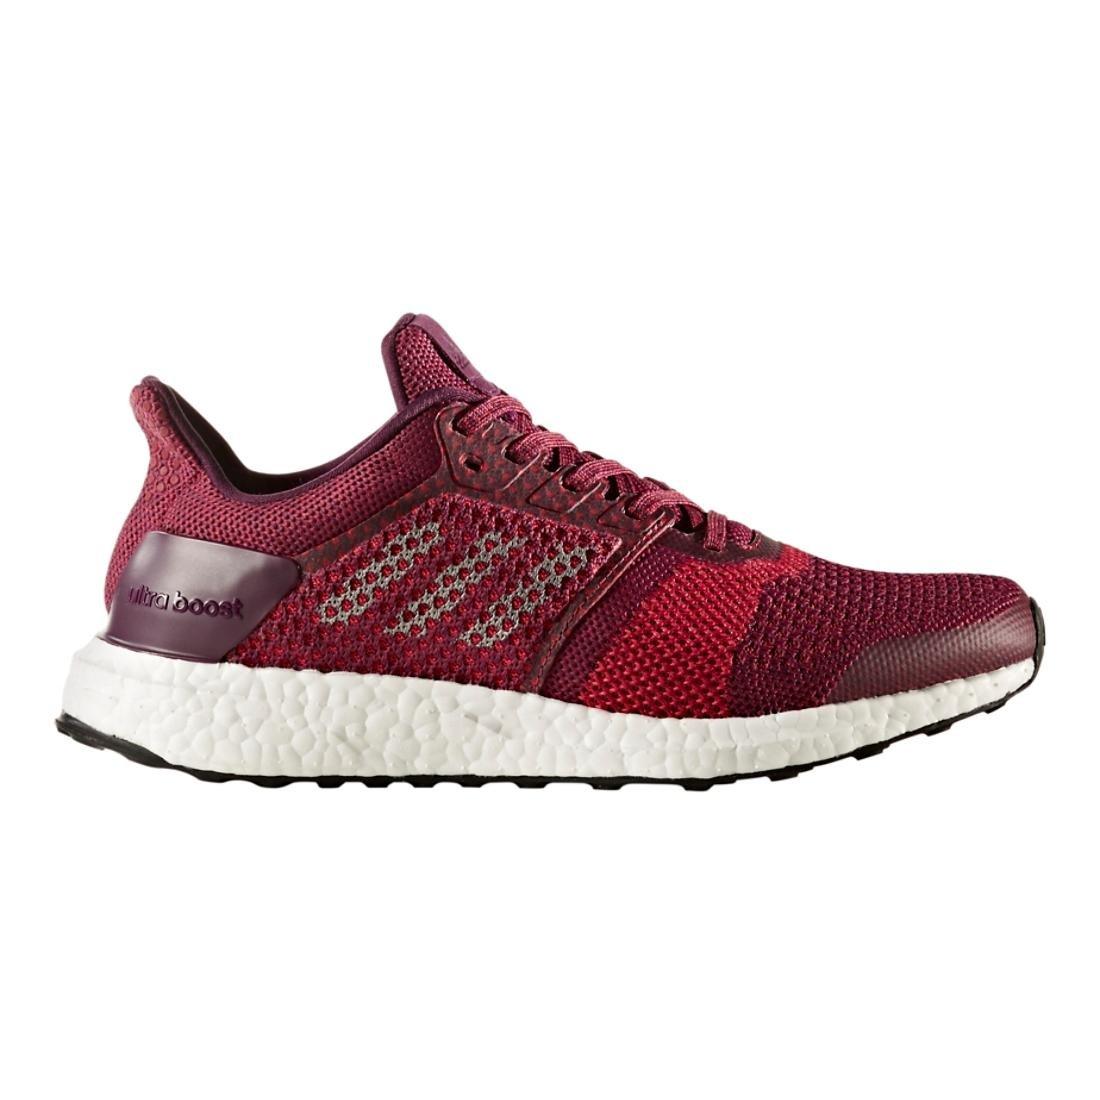 adidas Women's Ultraboost St Parley Running Shoe B075RZFGQZ 10 B(M) US|Mystery Ruby